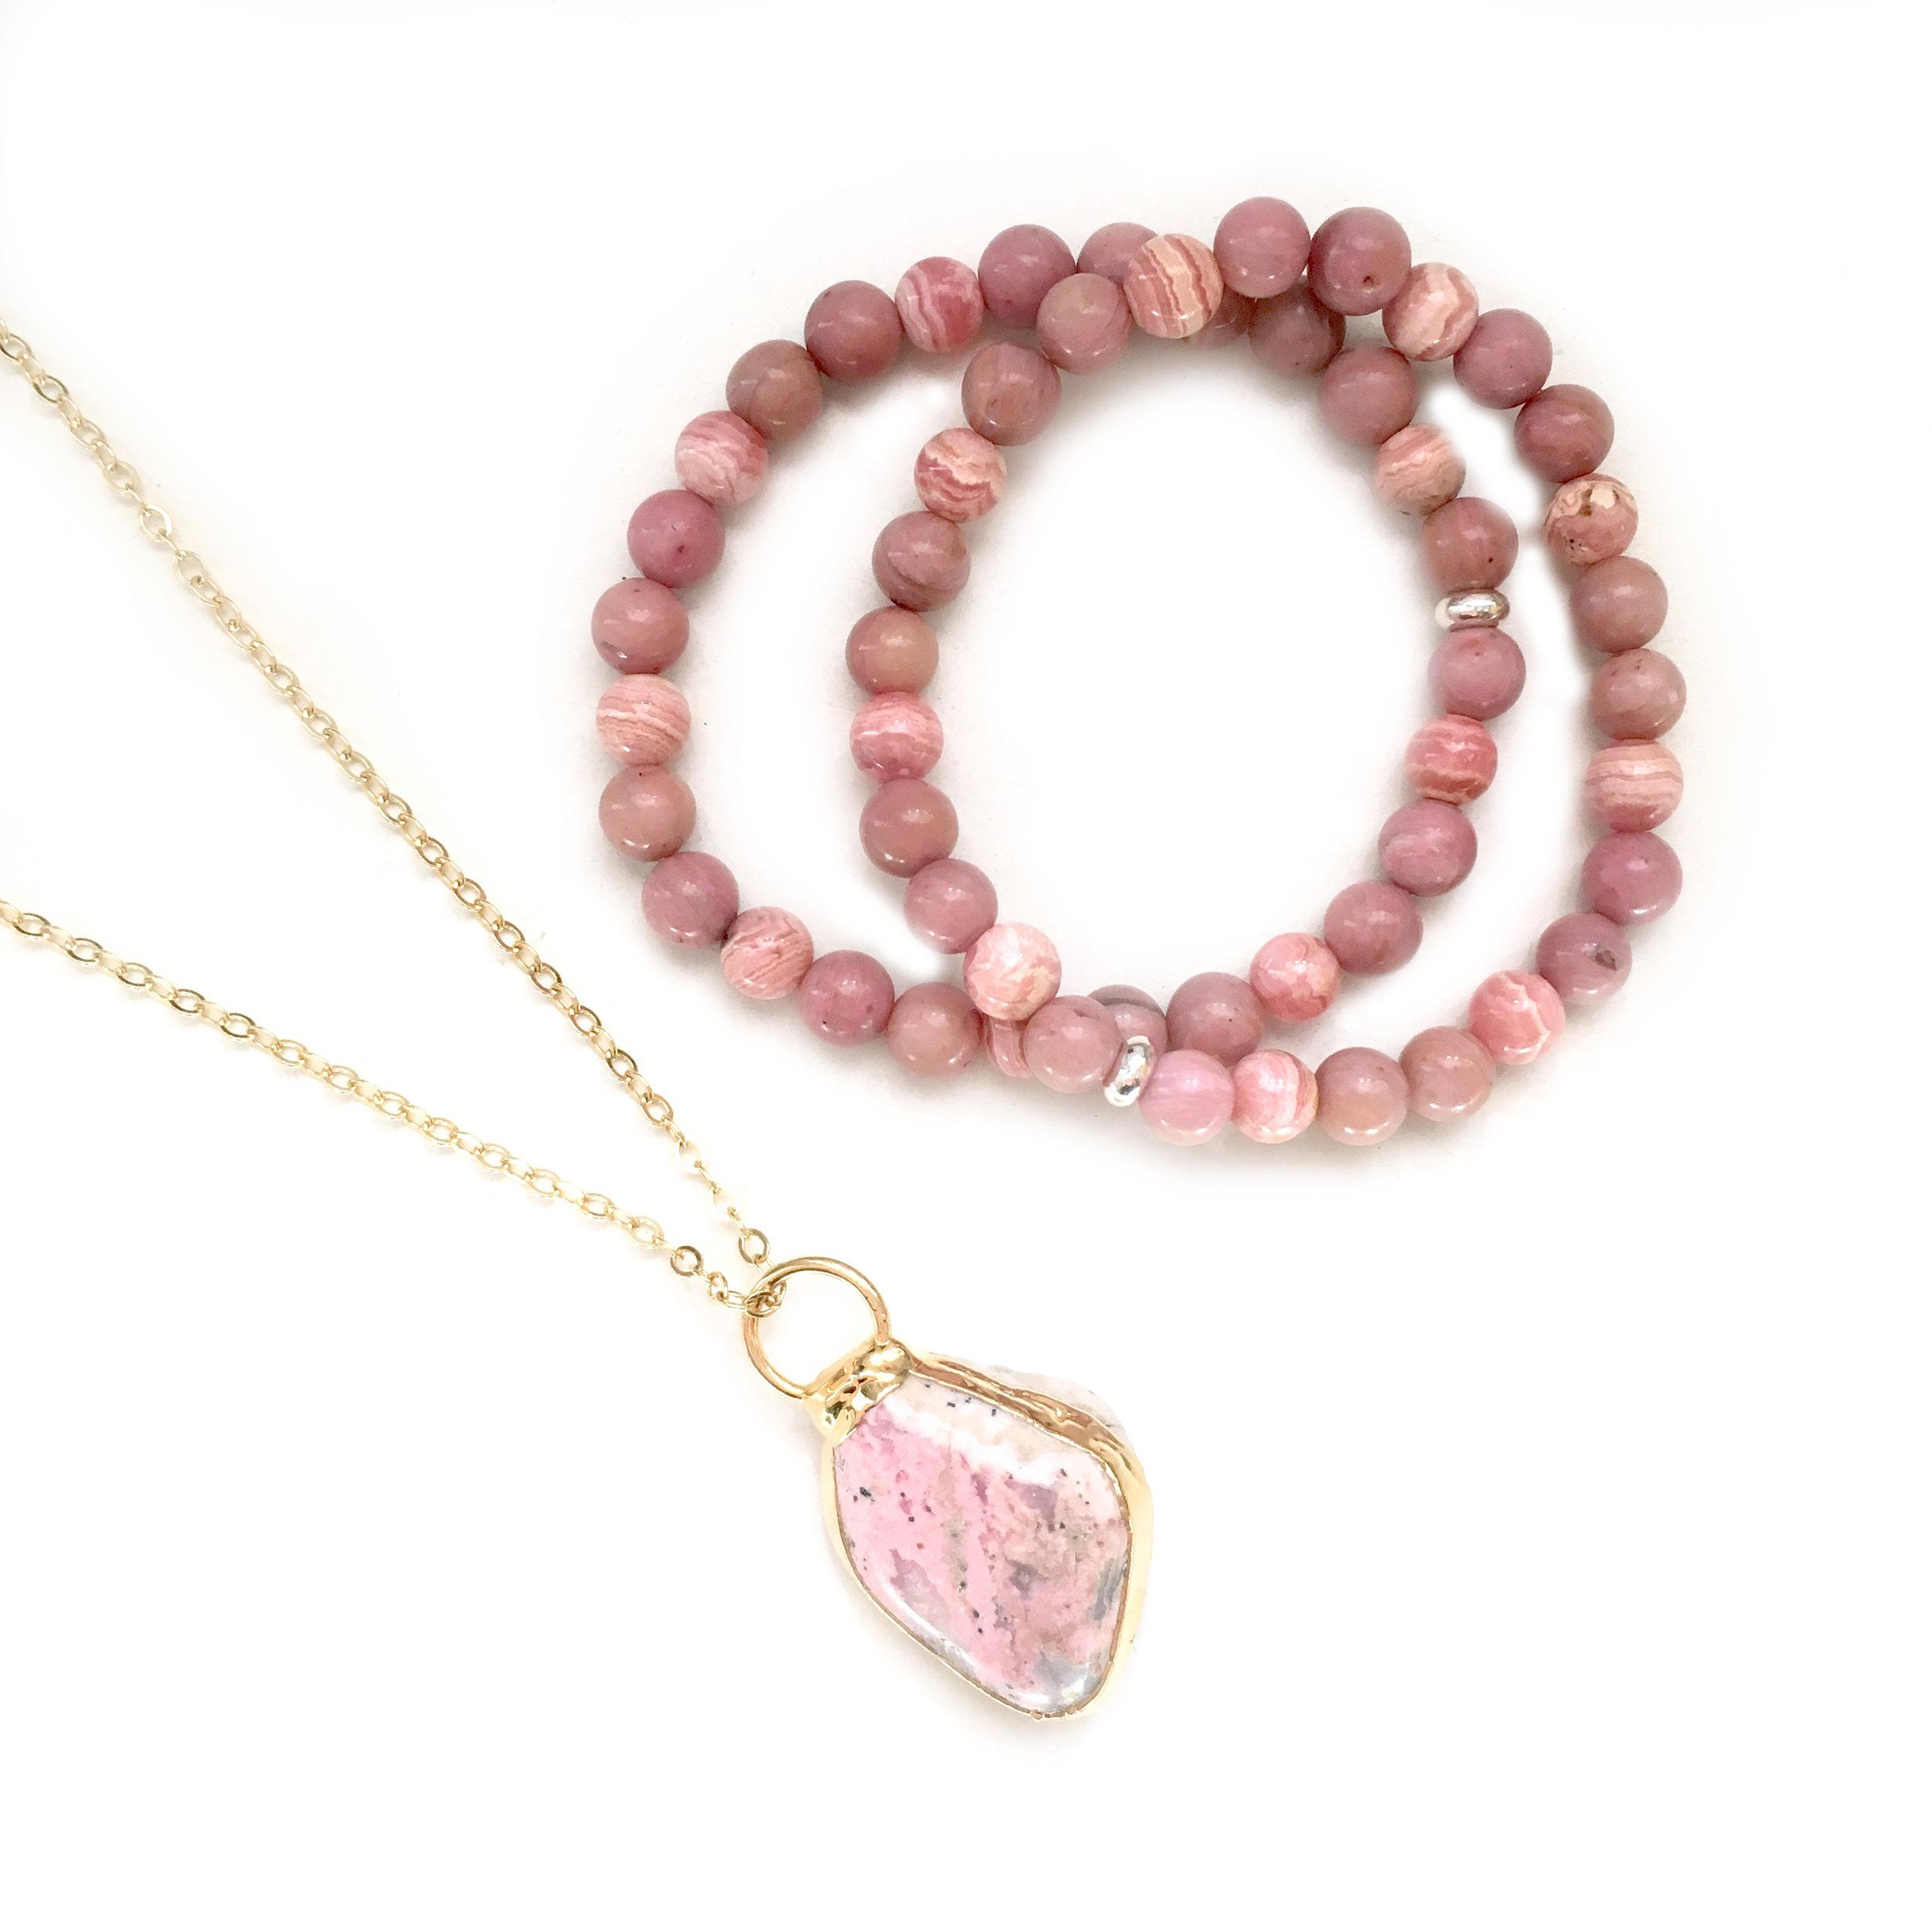 Rhodochrosite Necklace, and Bracelets containing Rhodochrosite and Pink Rhodonite